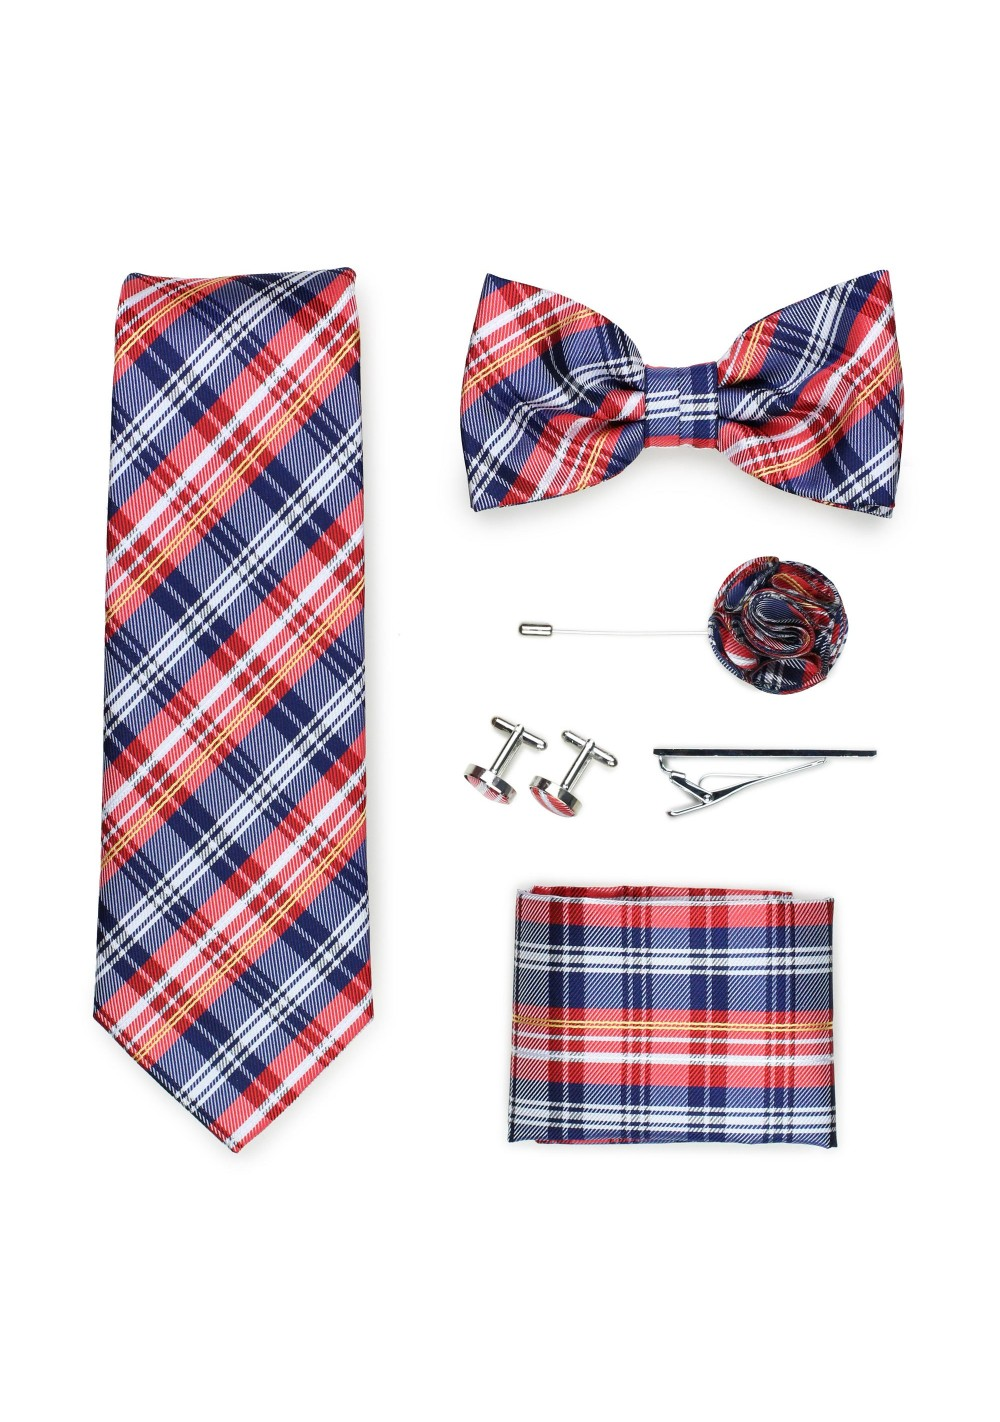 plaid tie gift menswear set